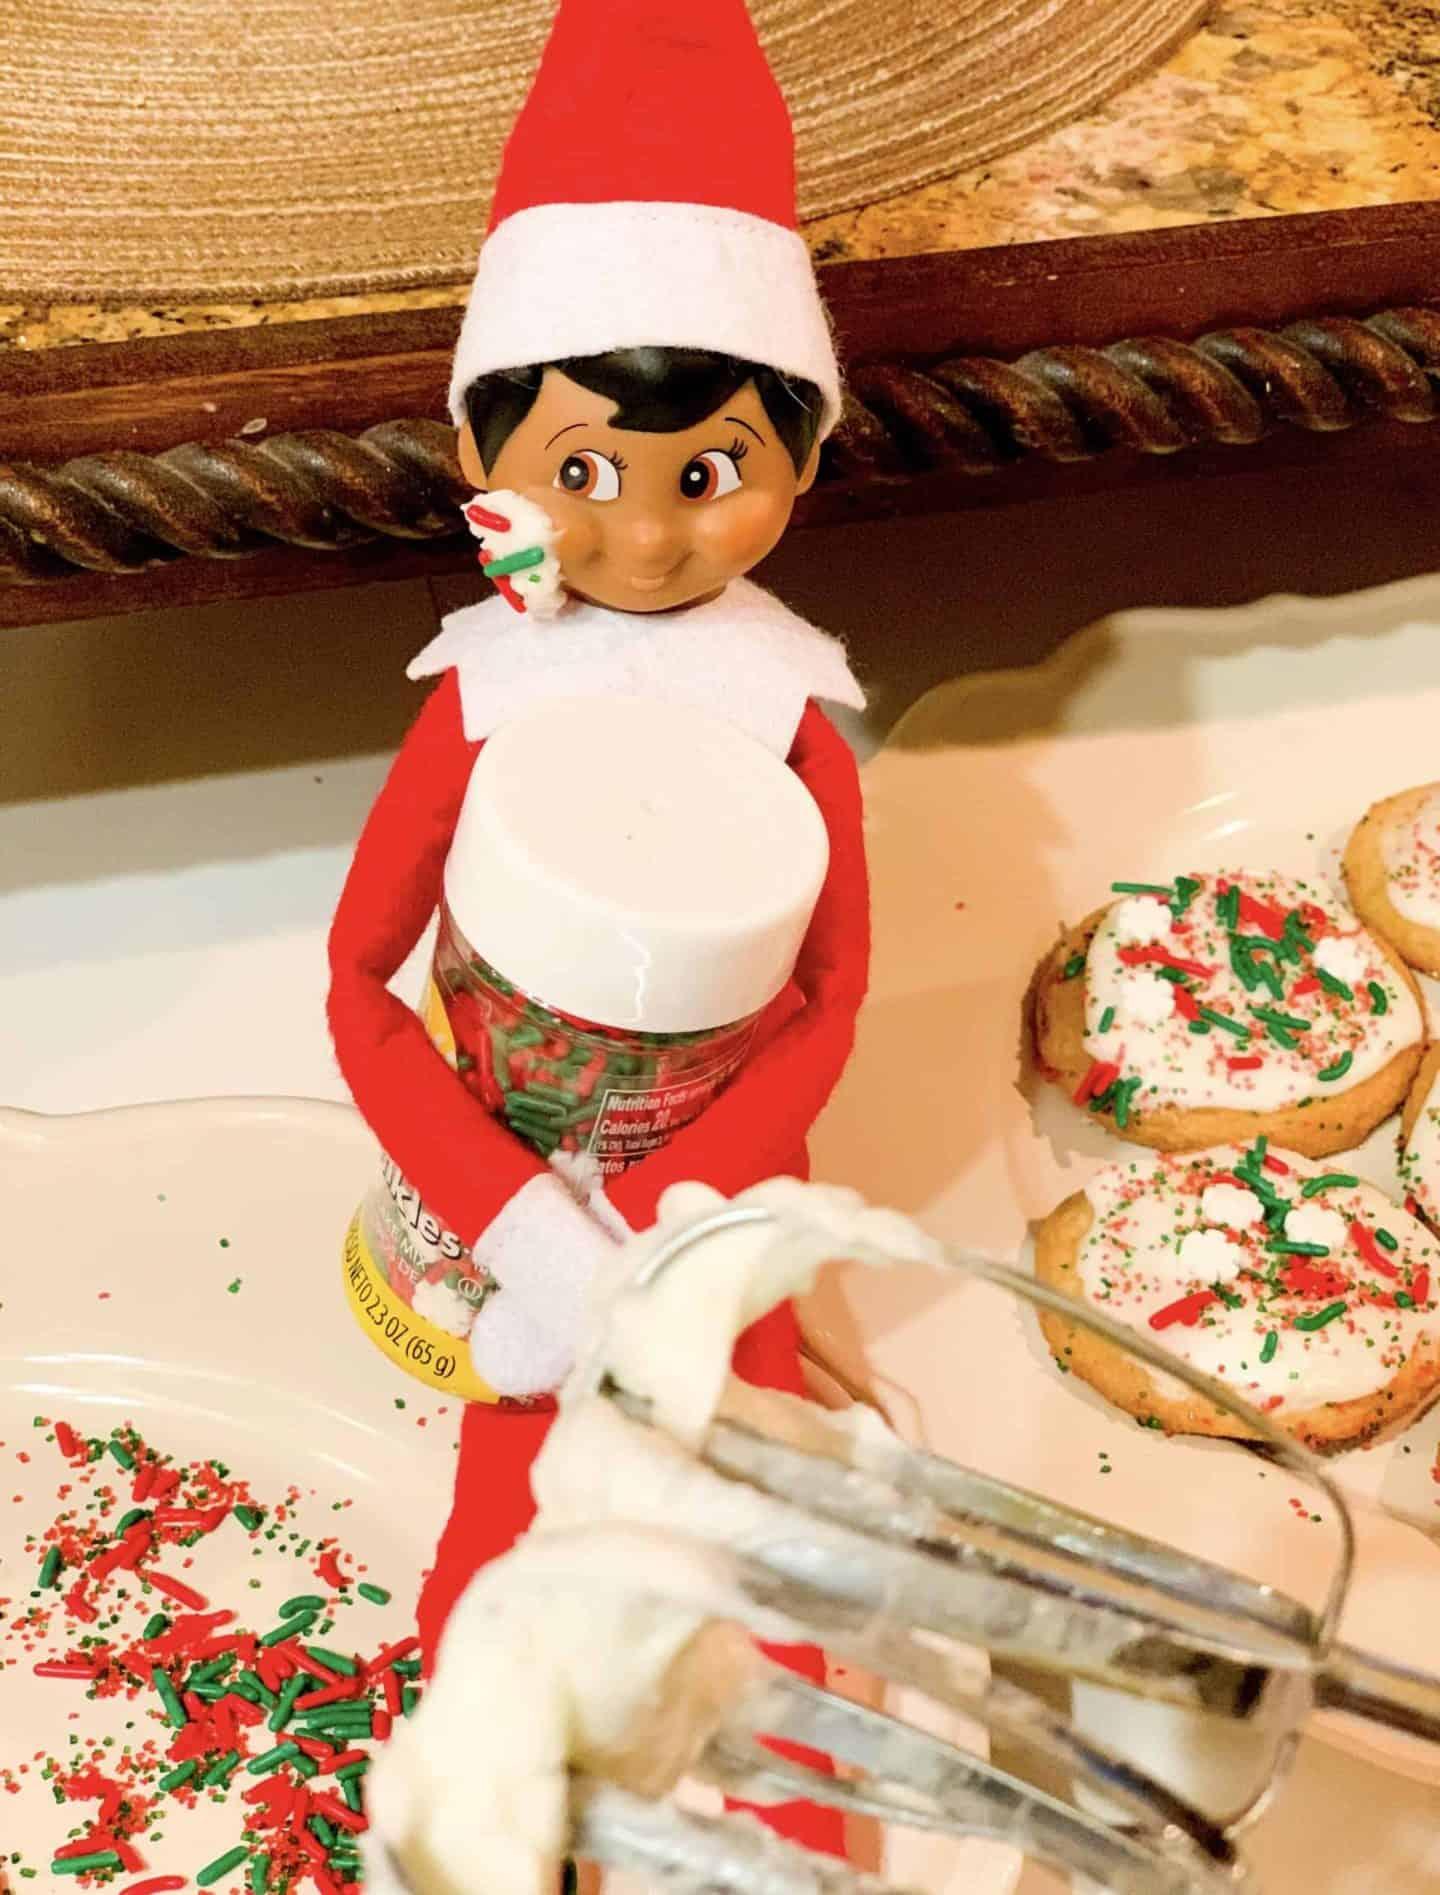 Elf on the shelf gets into Christmas cookies